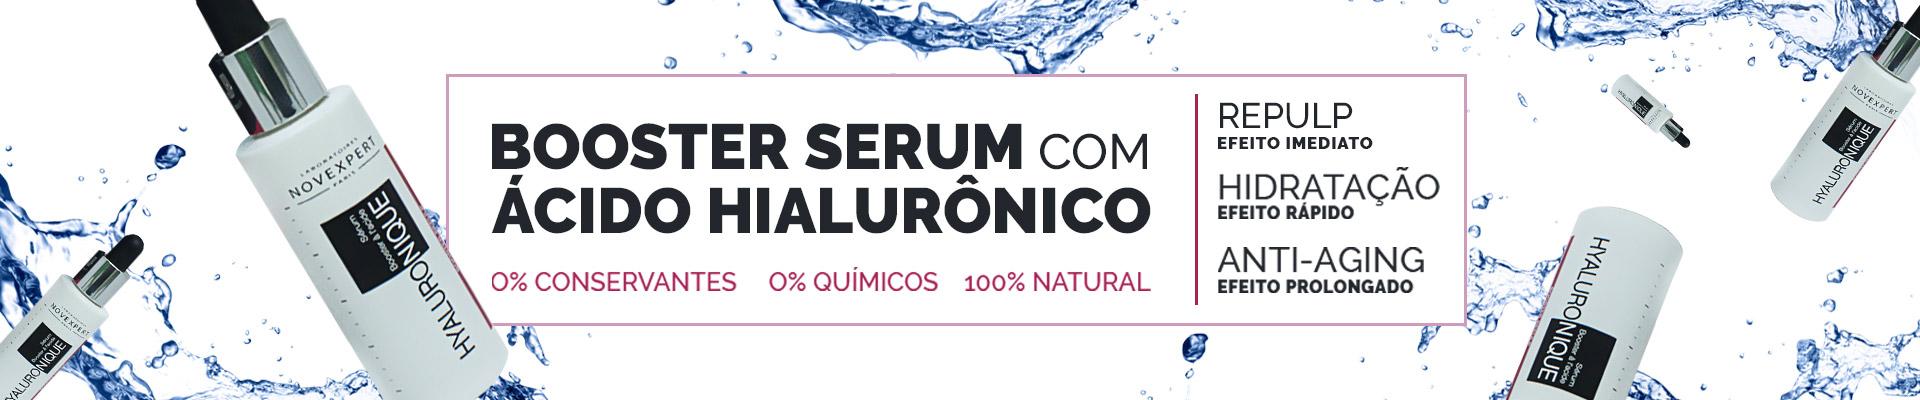 Booster Serum, Ácido Hialurônico, Preenchimento facial, antiaging, anti-aging, antiidade, aiti-idade